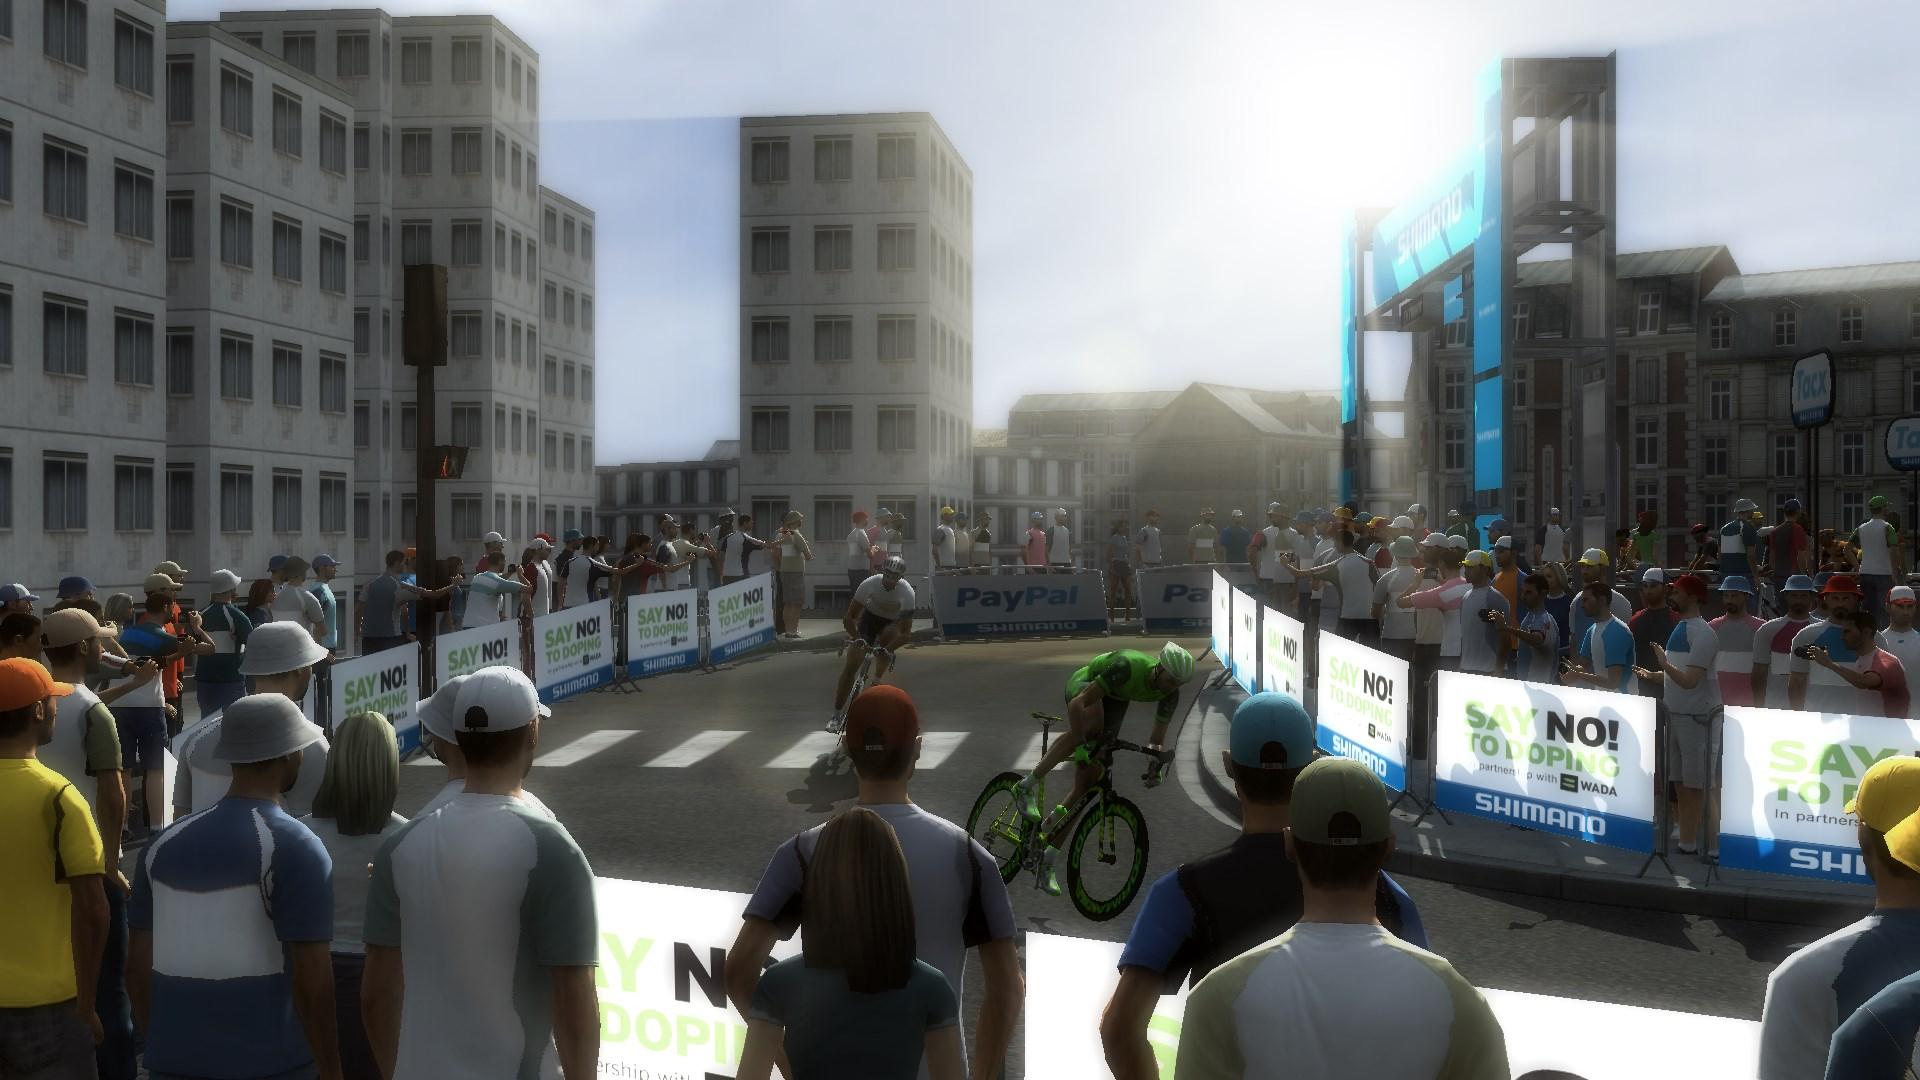 pcmdaily.com/images/mg/2017/Races/HC/lgp/lgp_9.jpg